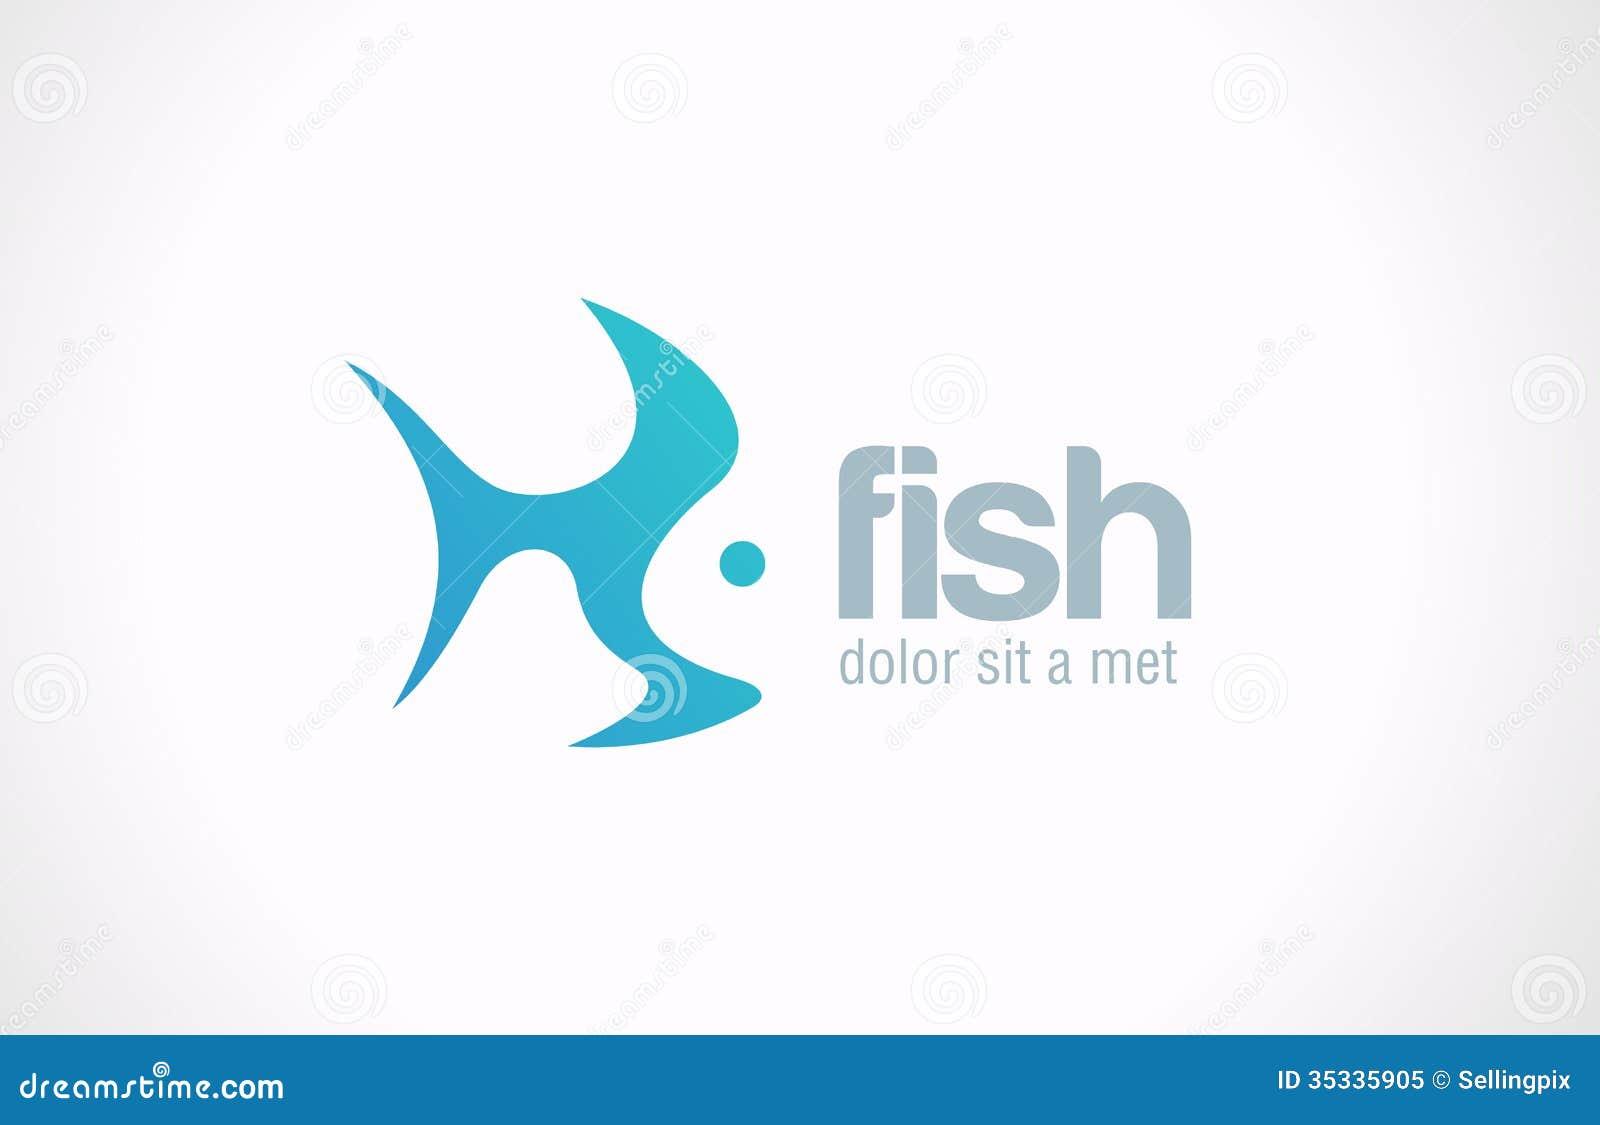 ... Creative Design Concept. Royalty Free Stock Photo - Image: 35335905